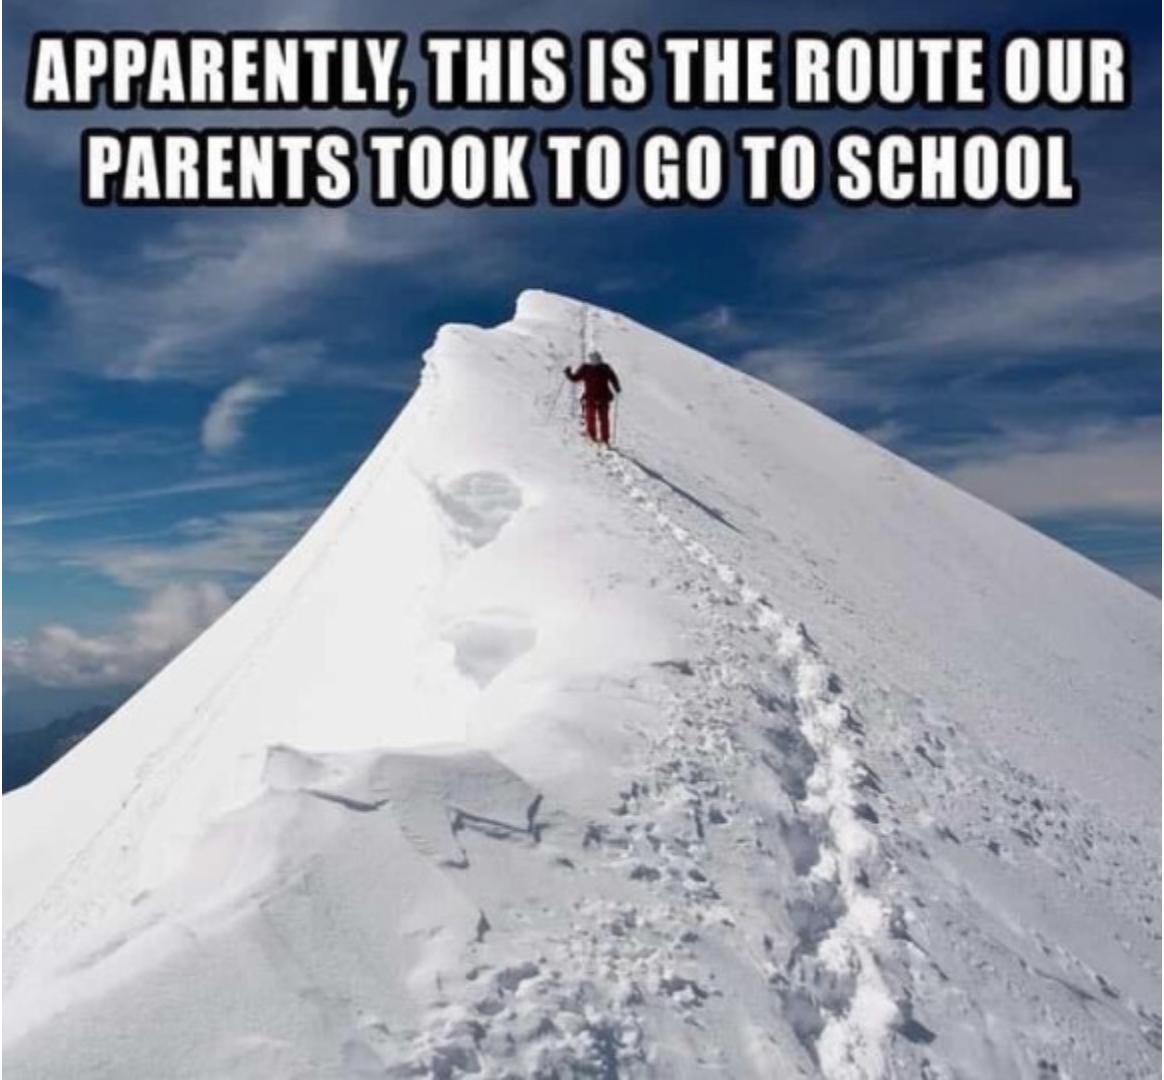 Parents route to school